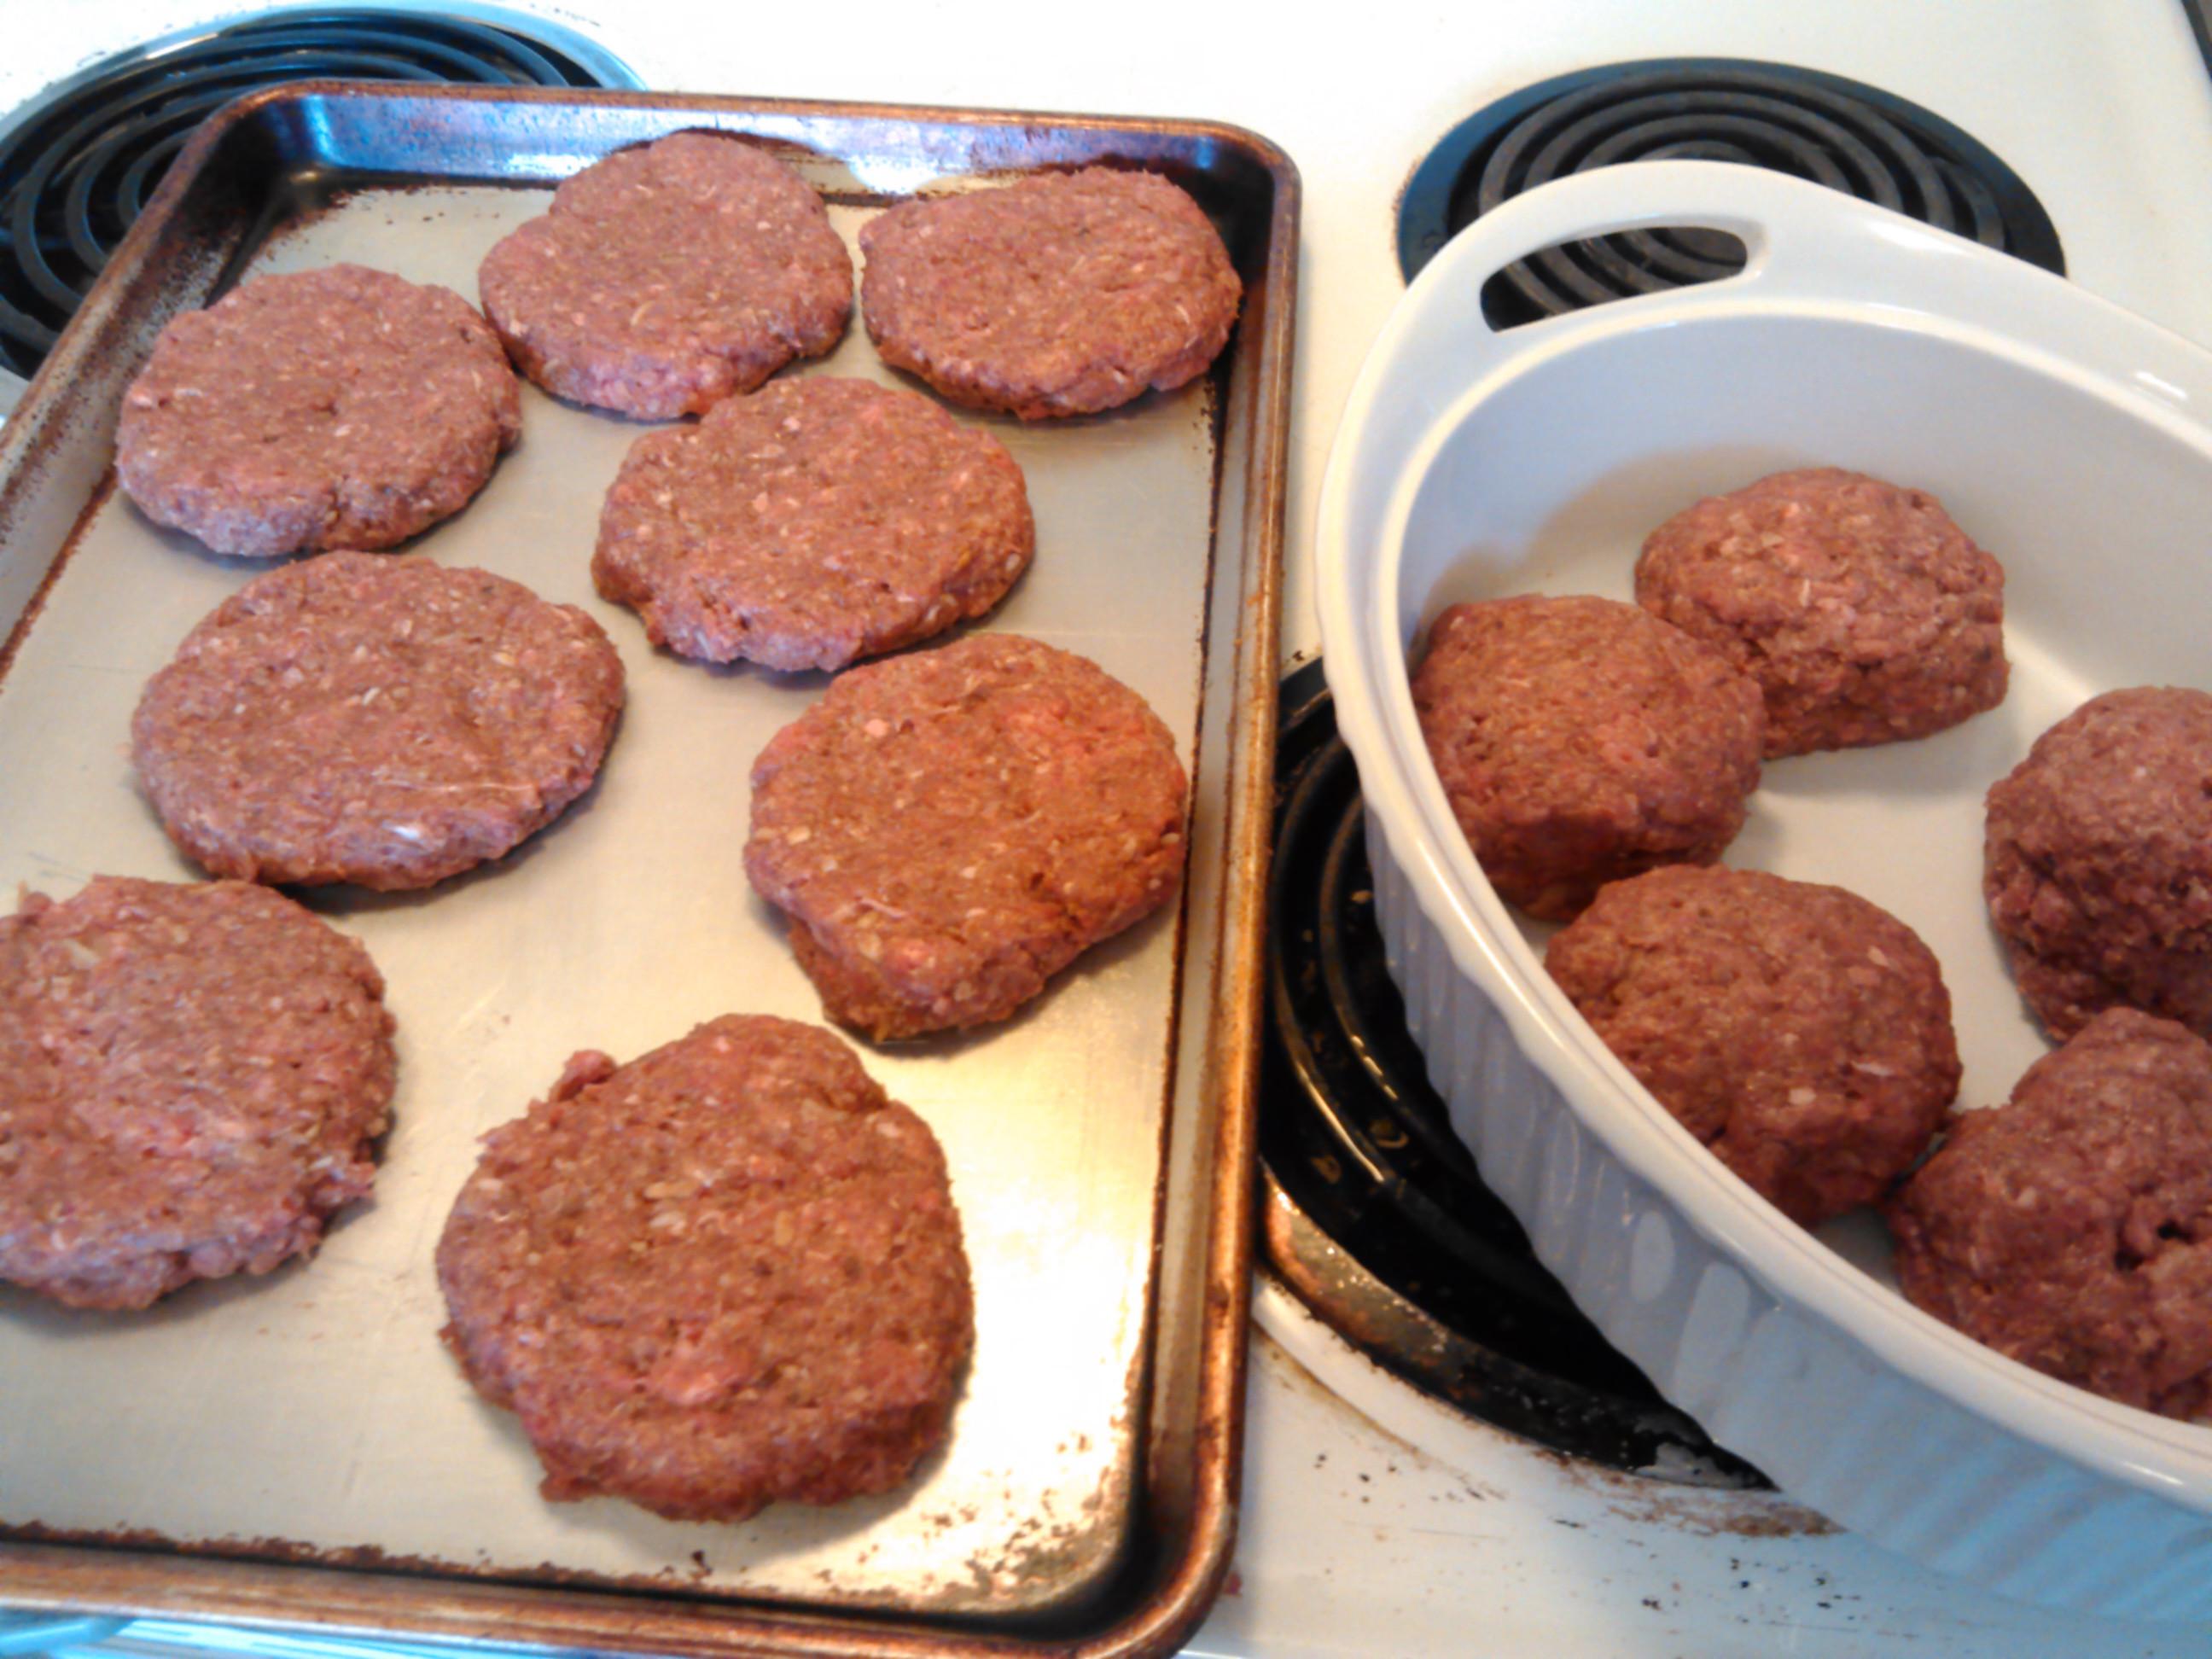 Lipton Souperior Meatloaf  Souperior Meatloaf – crazyndncook